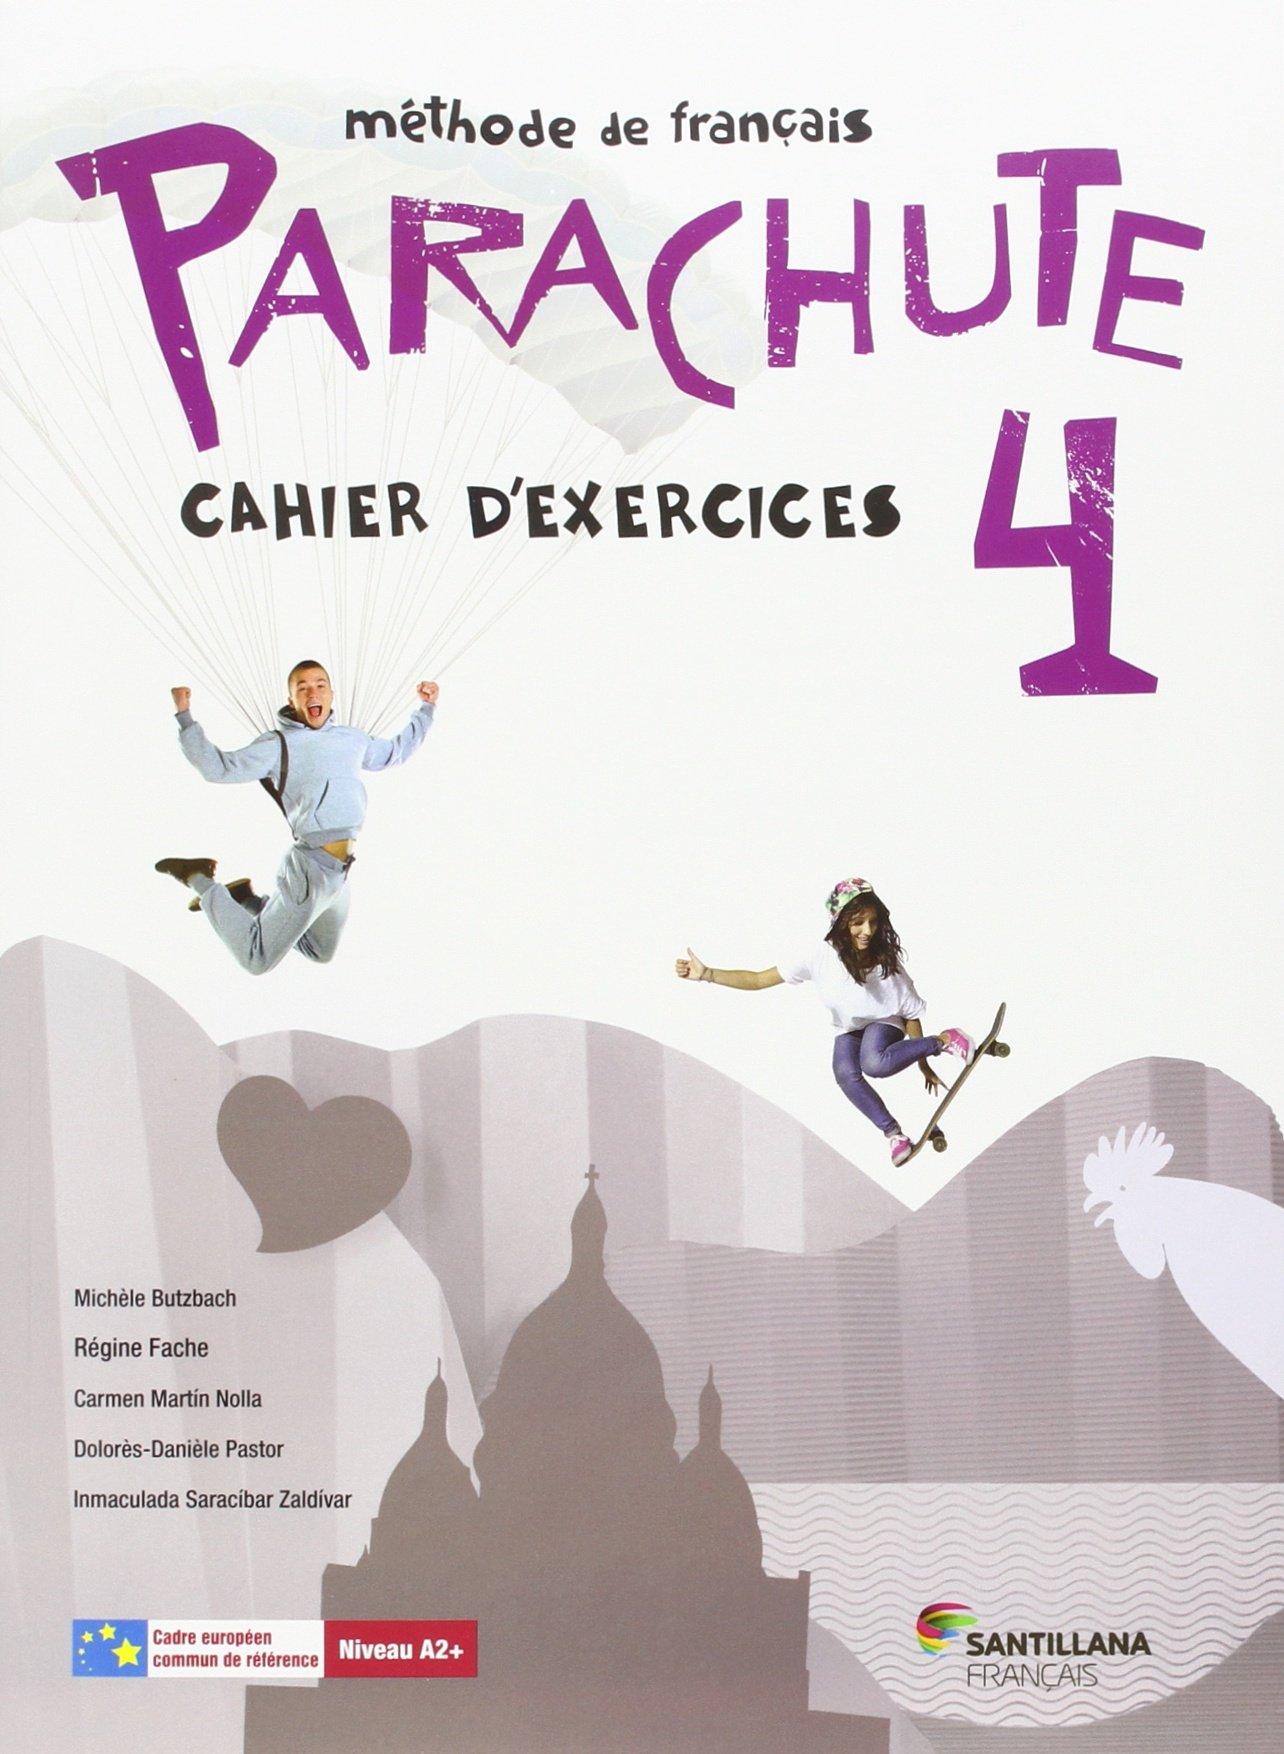 PARACHUTE 4 PACK CAHIER D'EXERCICES - 9788490492154 Tapa blanda – 18 jul 2016 Varios autores Santillana Français 8490492158 Lengua extranjera: francés